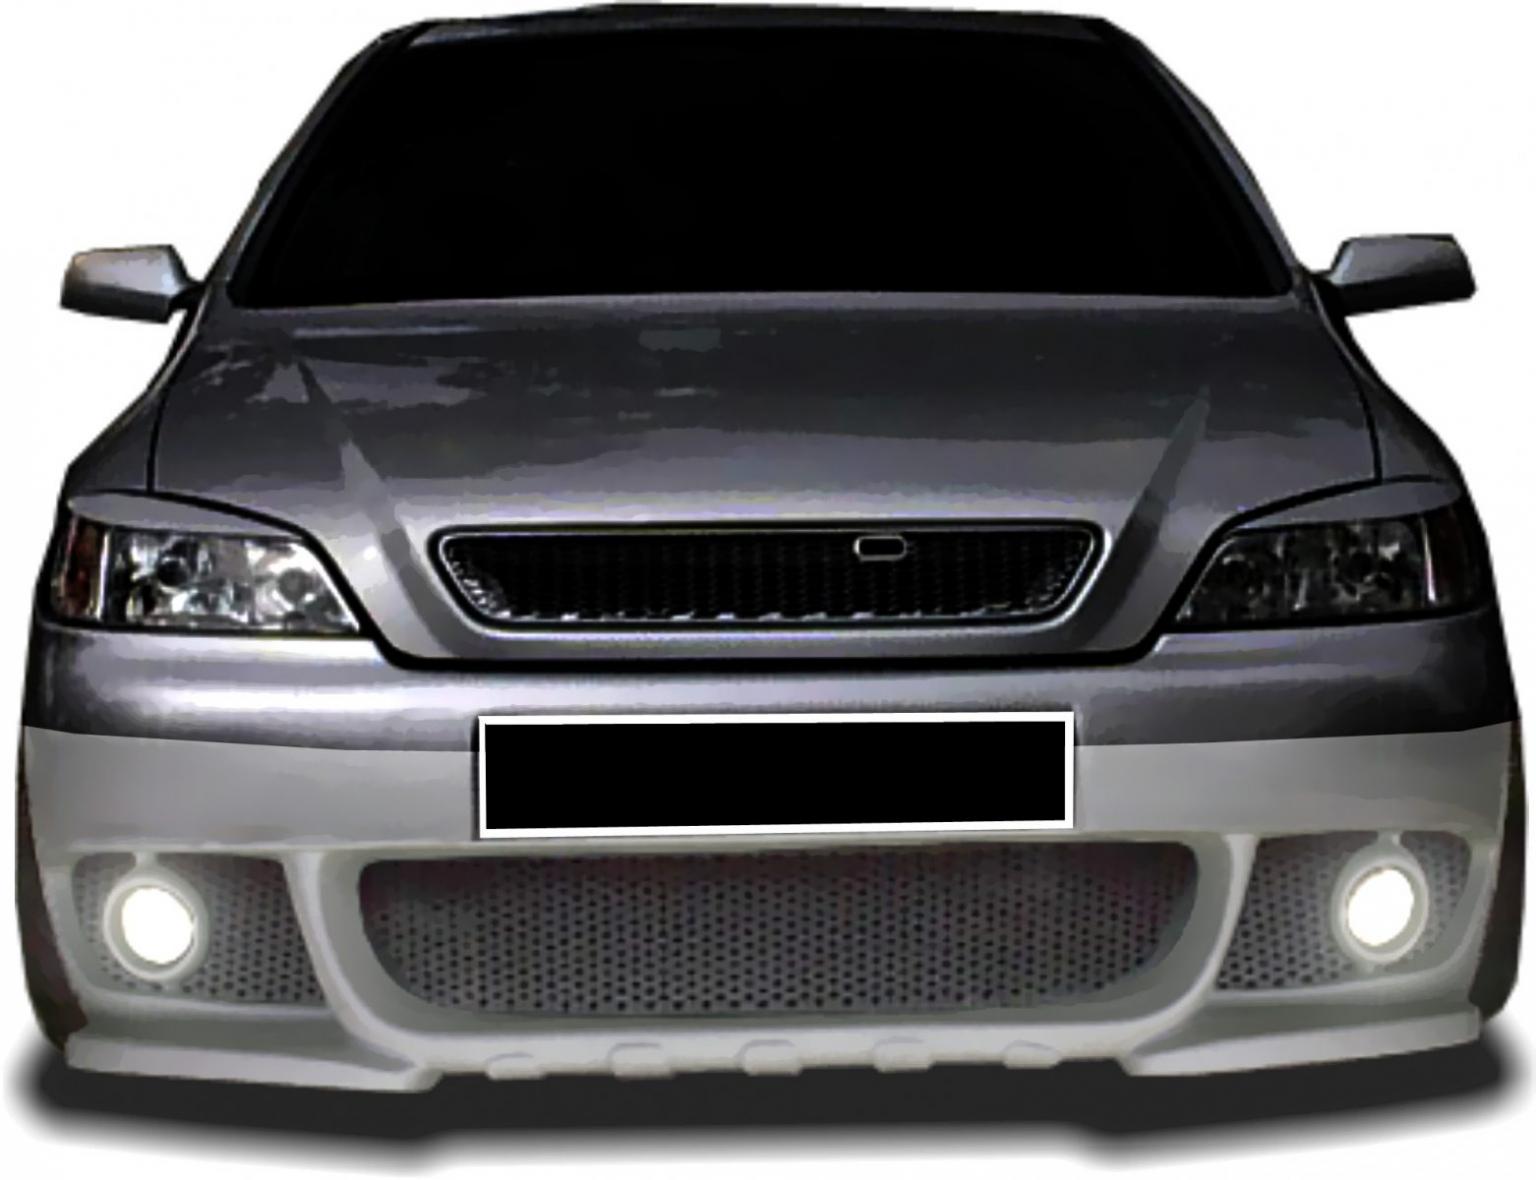 Opel-Astra-G-Apache-Frt-SPU0362